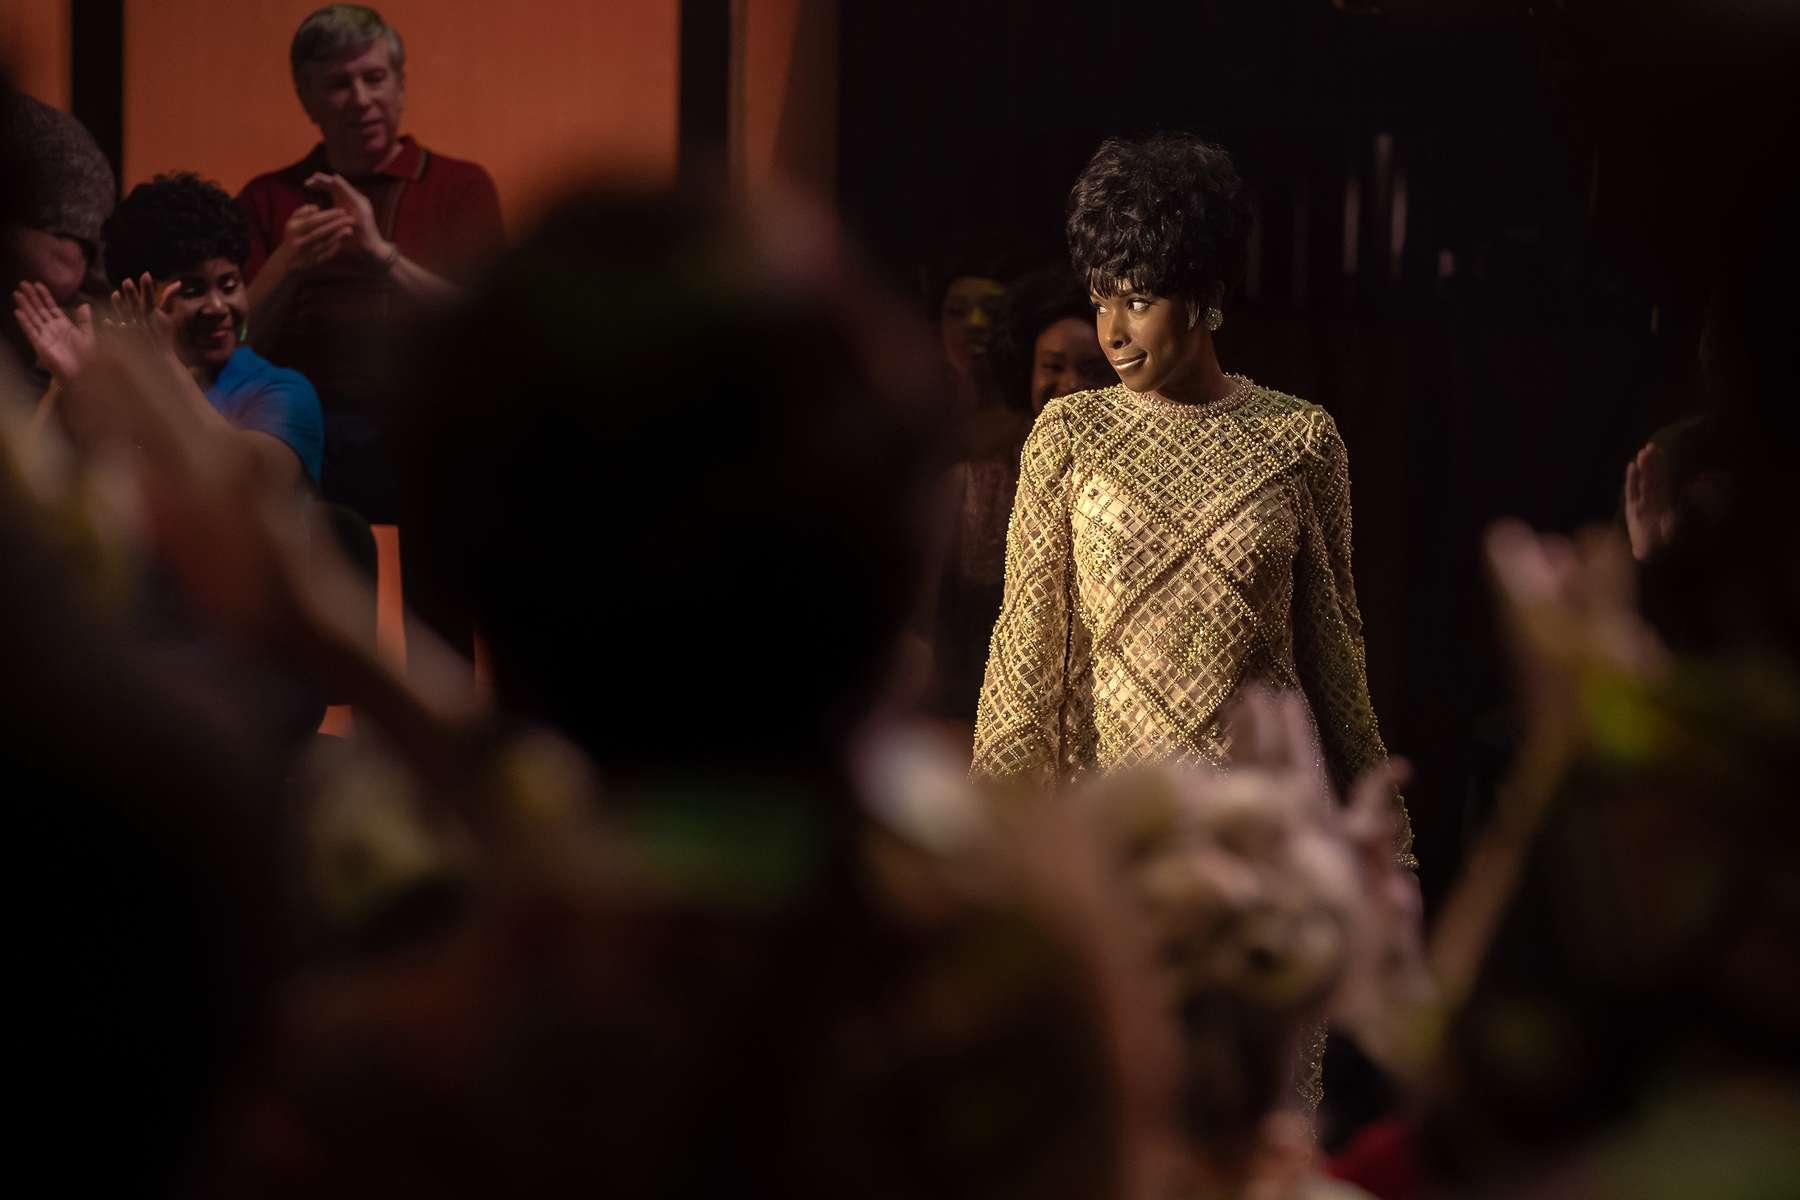 R_20803_RCJennifer Hudson stars as Aretha Franklin inRESPECT, A Metro Goldwyn Mayer Pictures filmPhoto credit: Quantrell D. Colbert